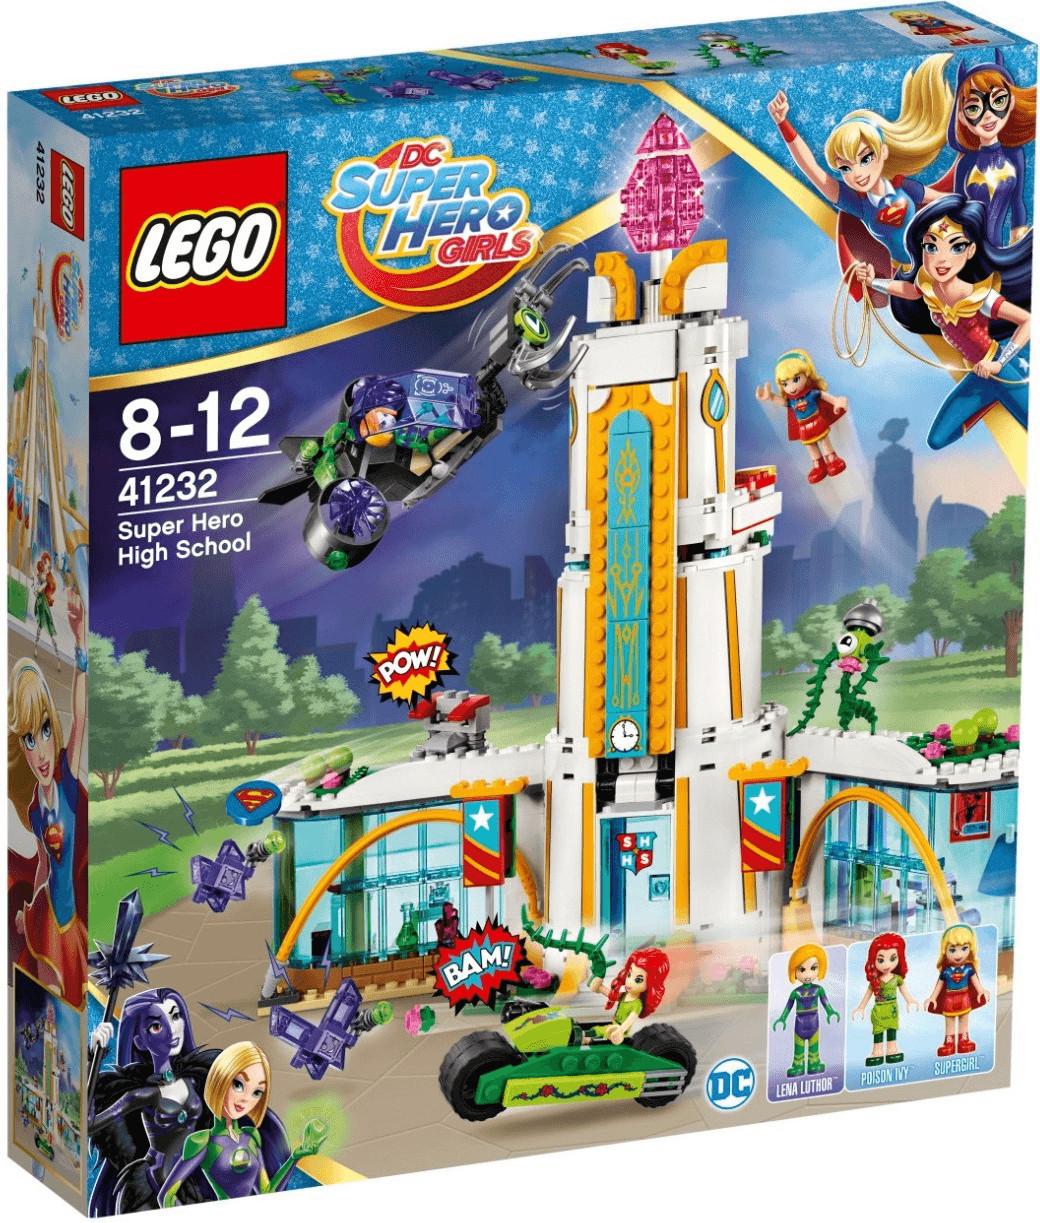 LEGO DC Super Hero Girls - Highschool der Super Heros (41232)